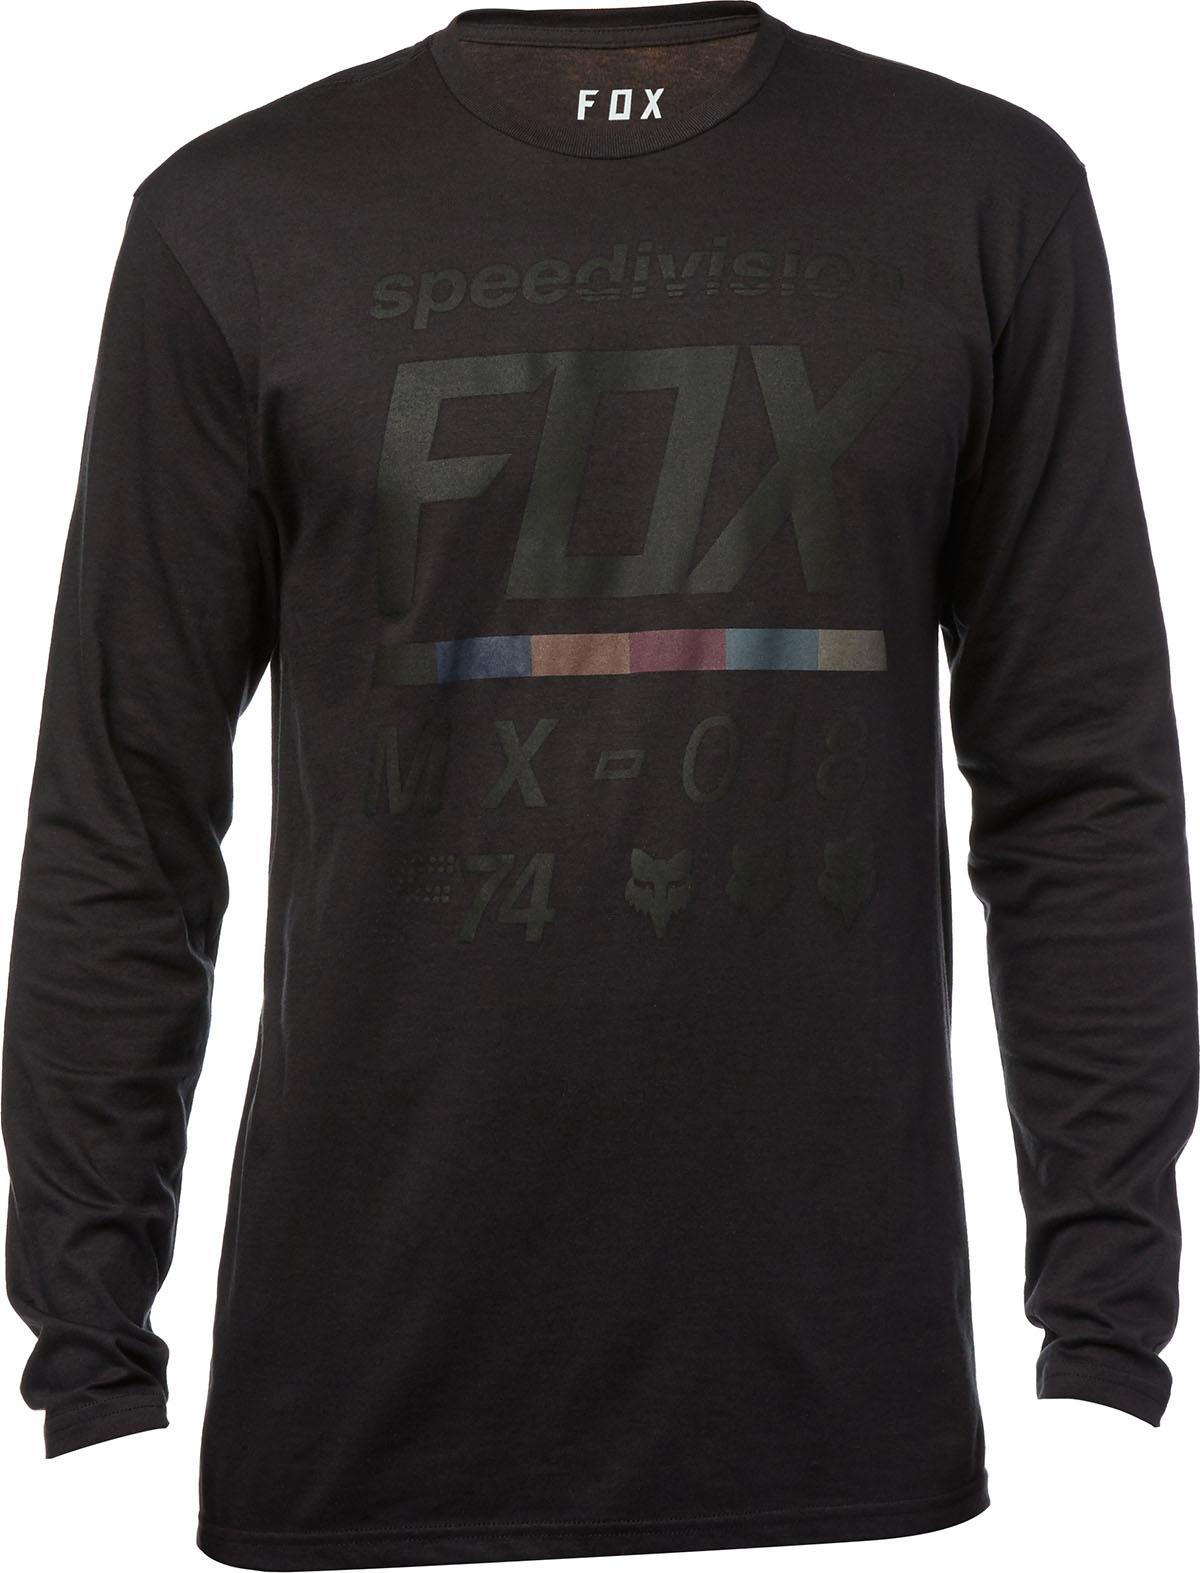 Fox hosszúujjú póló Draftr Tech